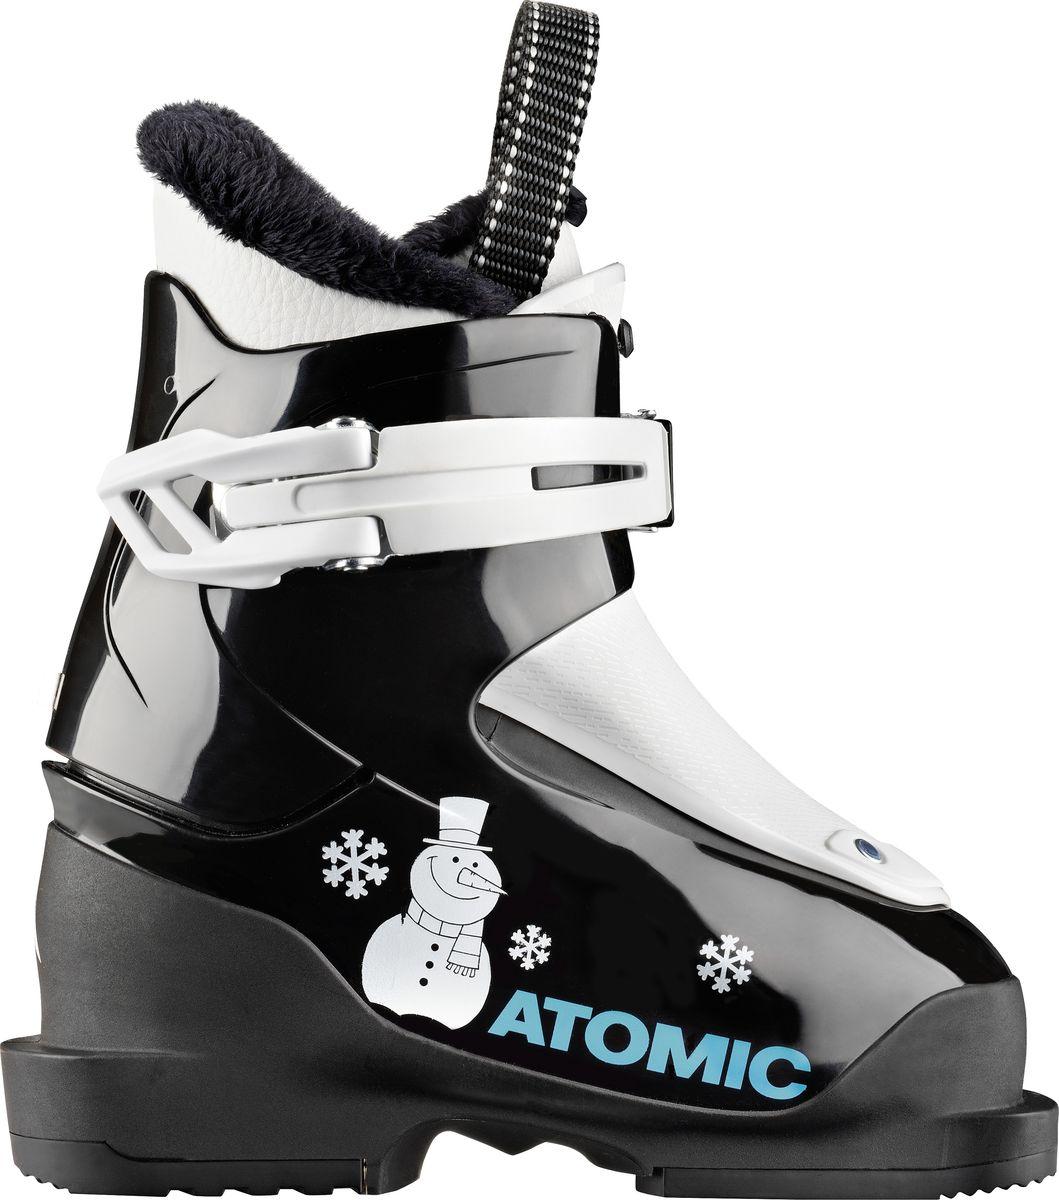 Ботинки горнолыжные Atomic Hawx Jr 1, цвет: черный, белый. Размер 24 10m 5m 3528 5050 rgb led strip light non waterproof led light 10m flexible rgb diode led tape set remote control power adapter